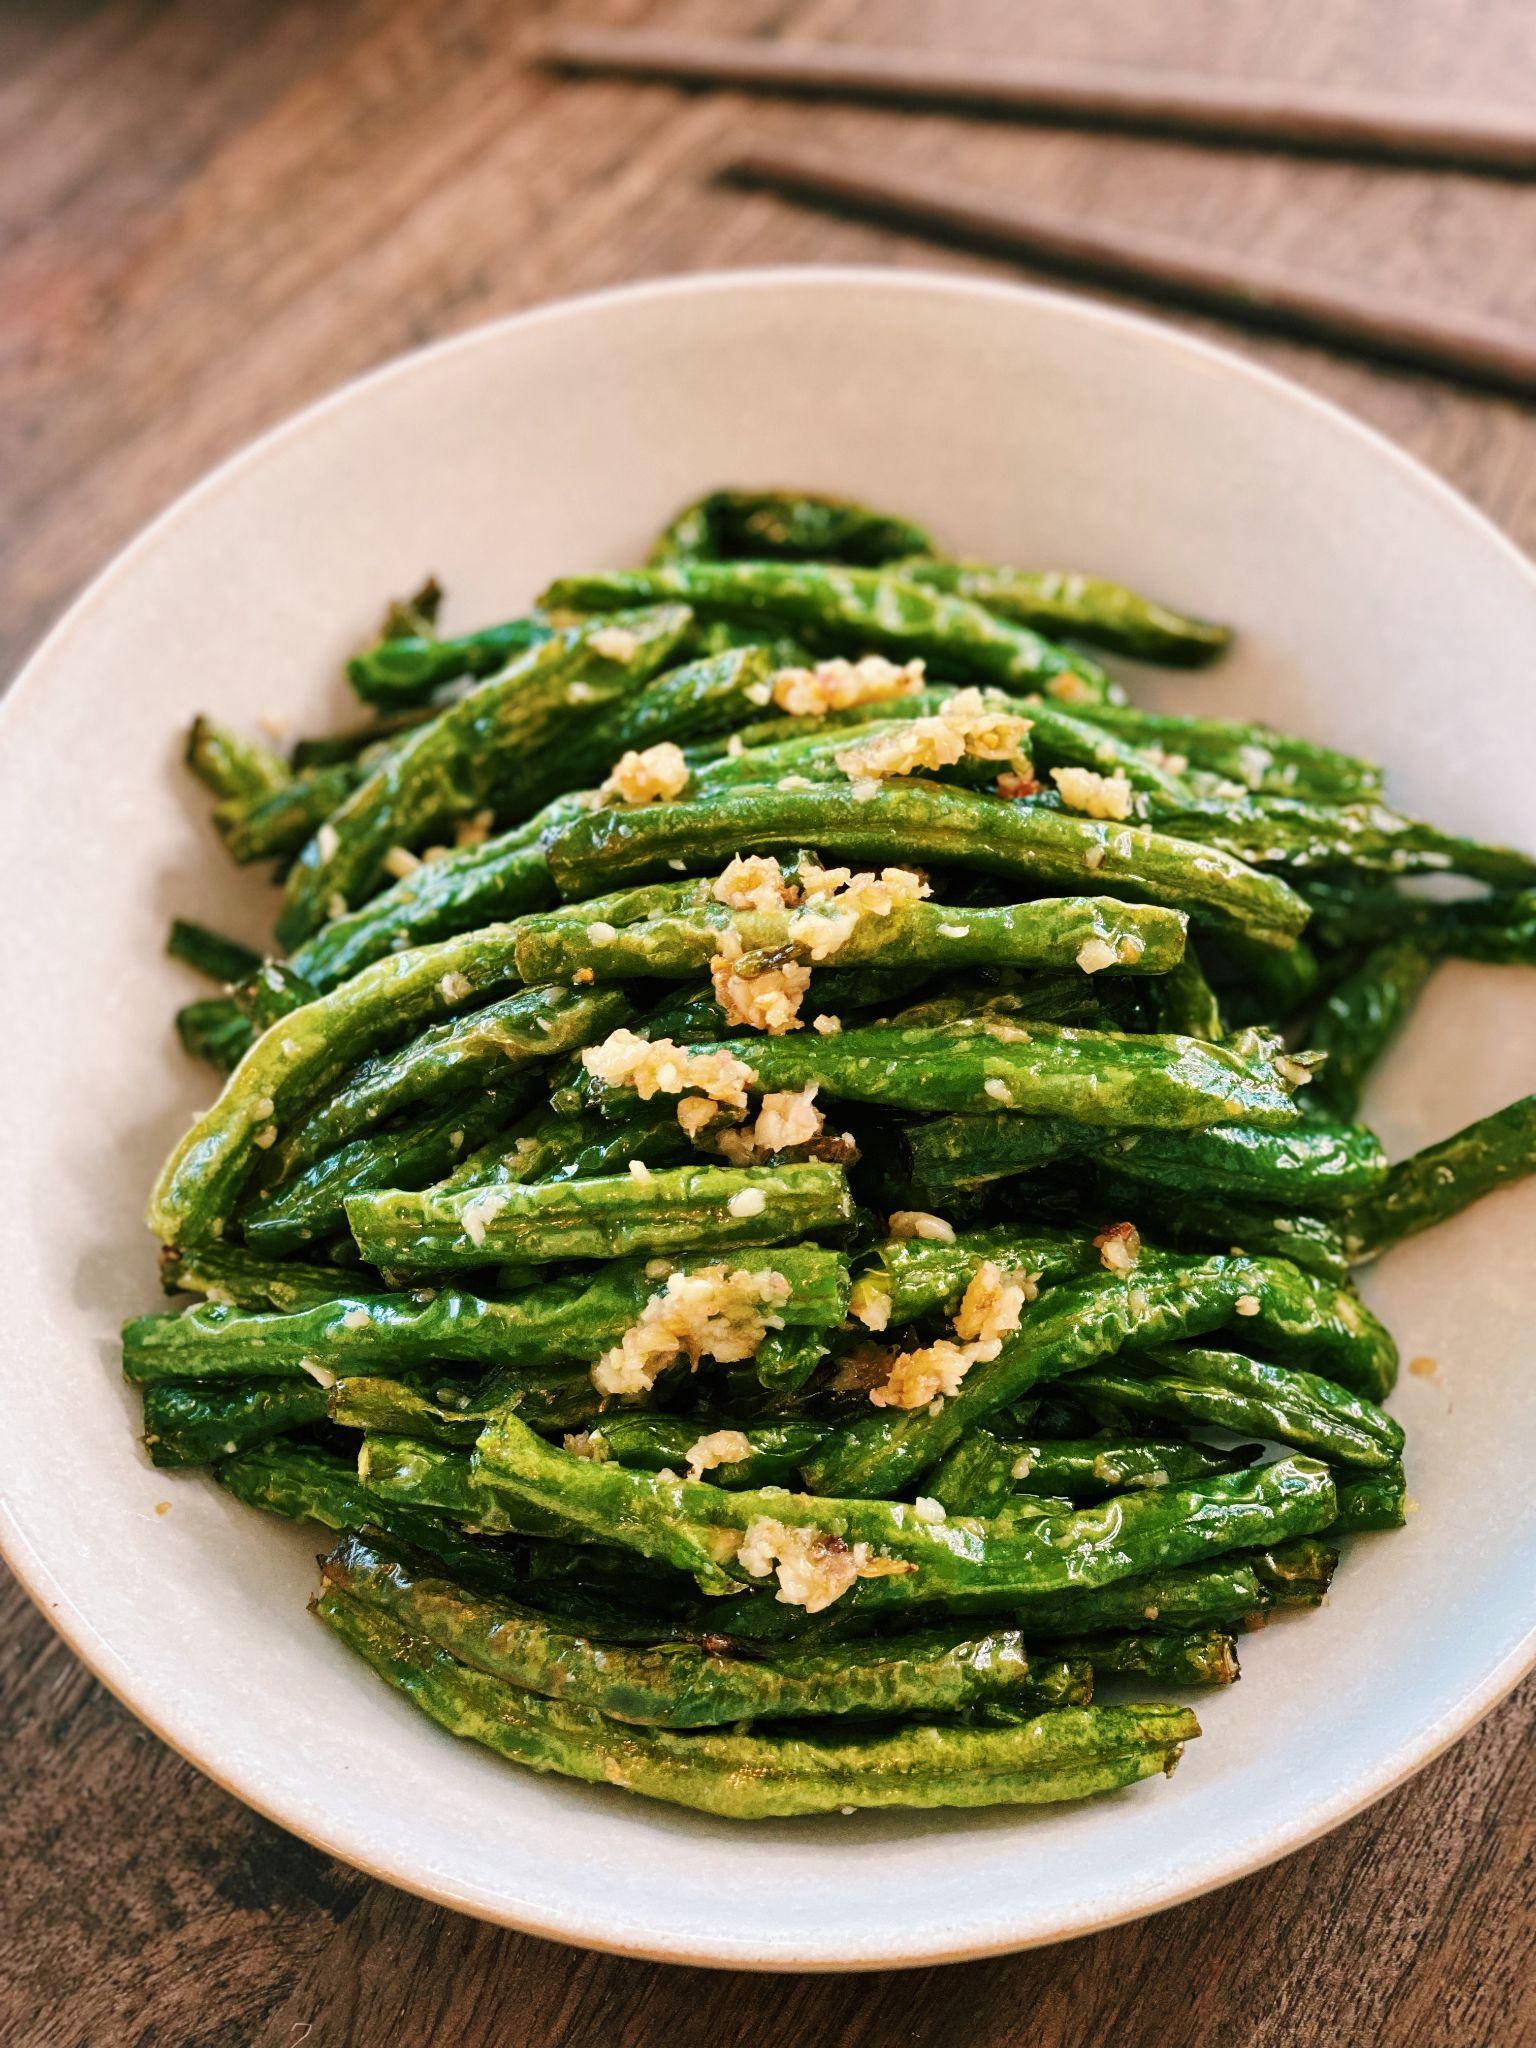 Stir-Fried Garlic Green Beans (3 Ingredients ONLY!)